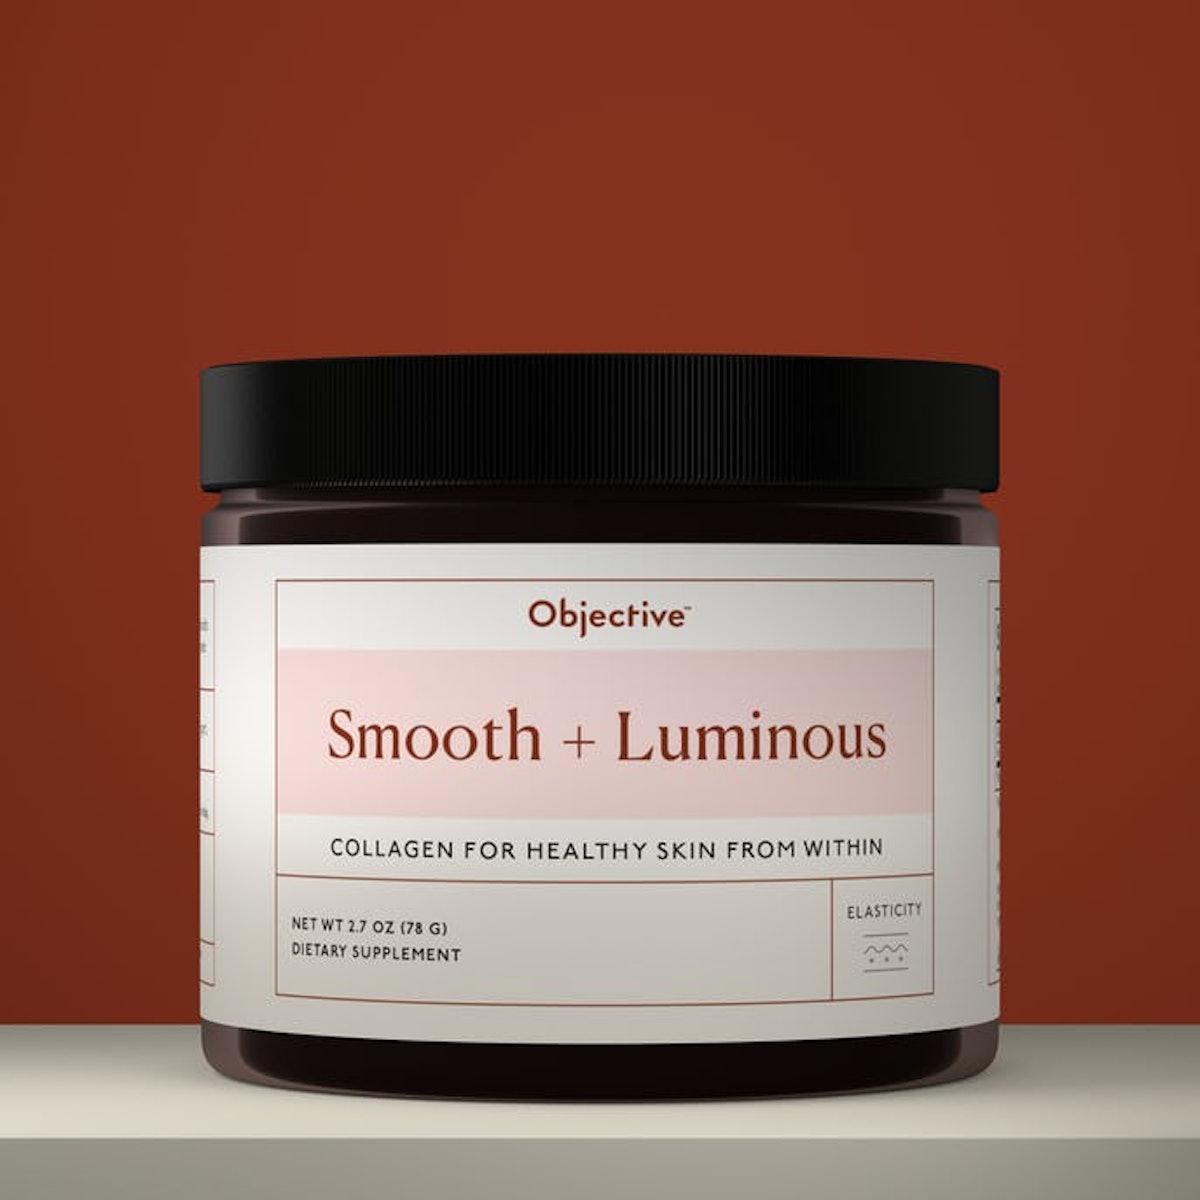 Smooth + Luminous Collagen Powder